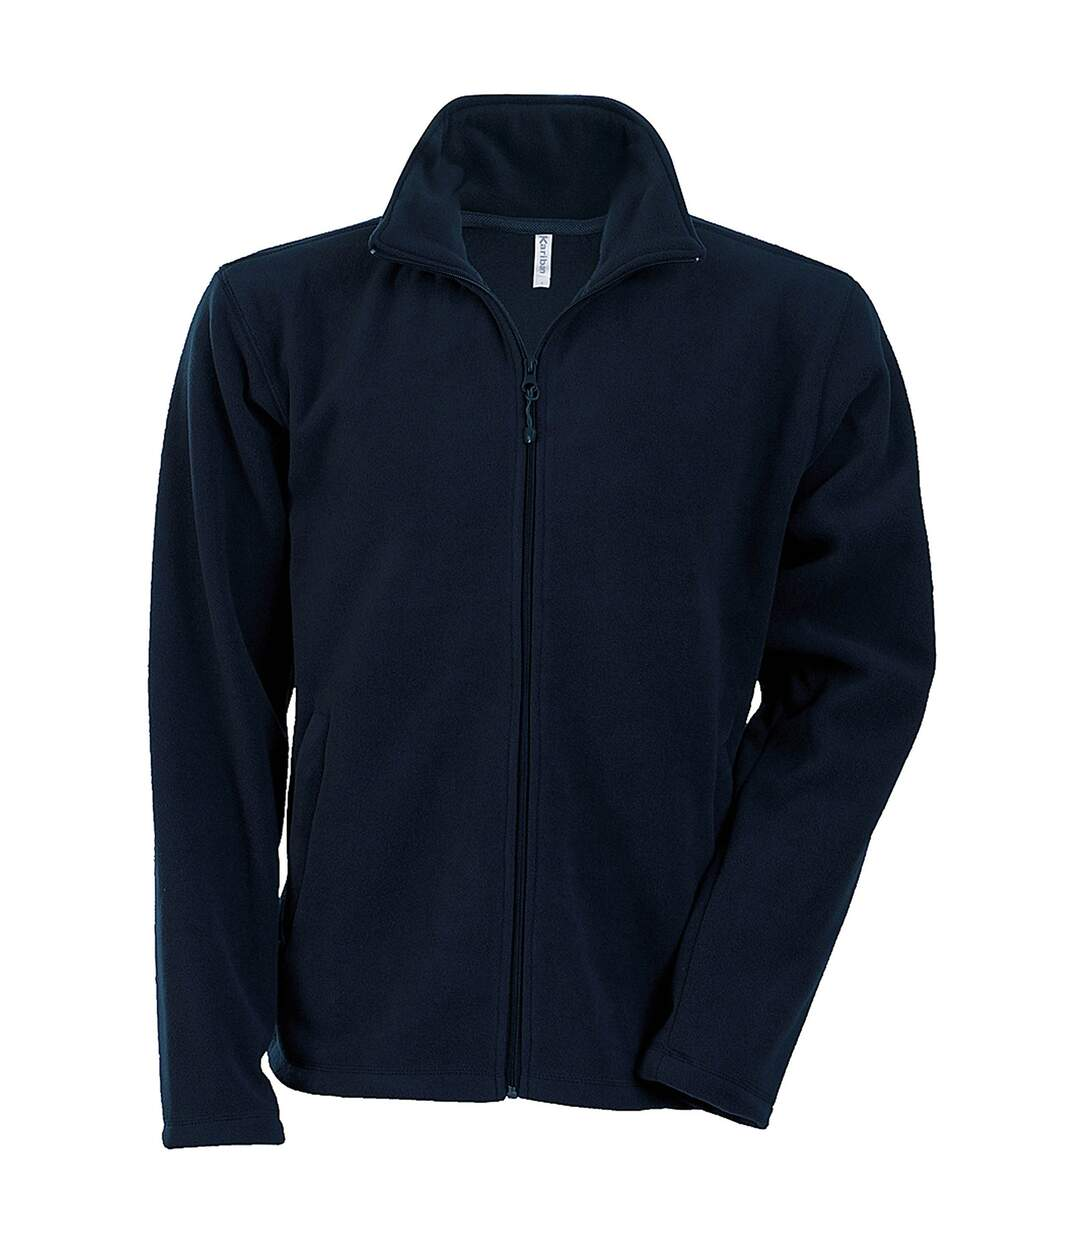 Kariban Mens Falco Full Zip Anti Pill Fleece Jacket (Navy) - UTRW737